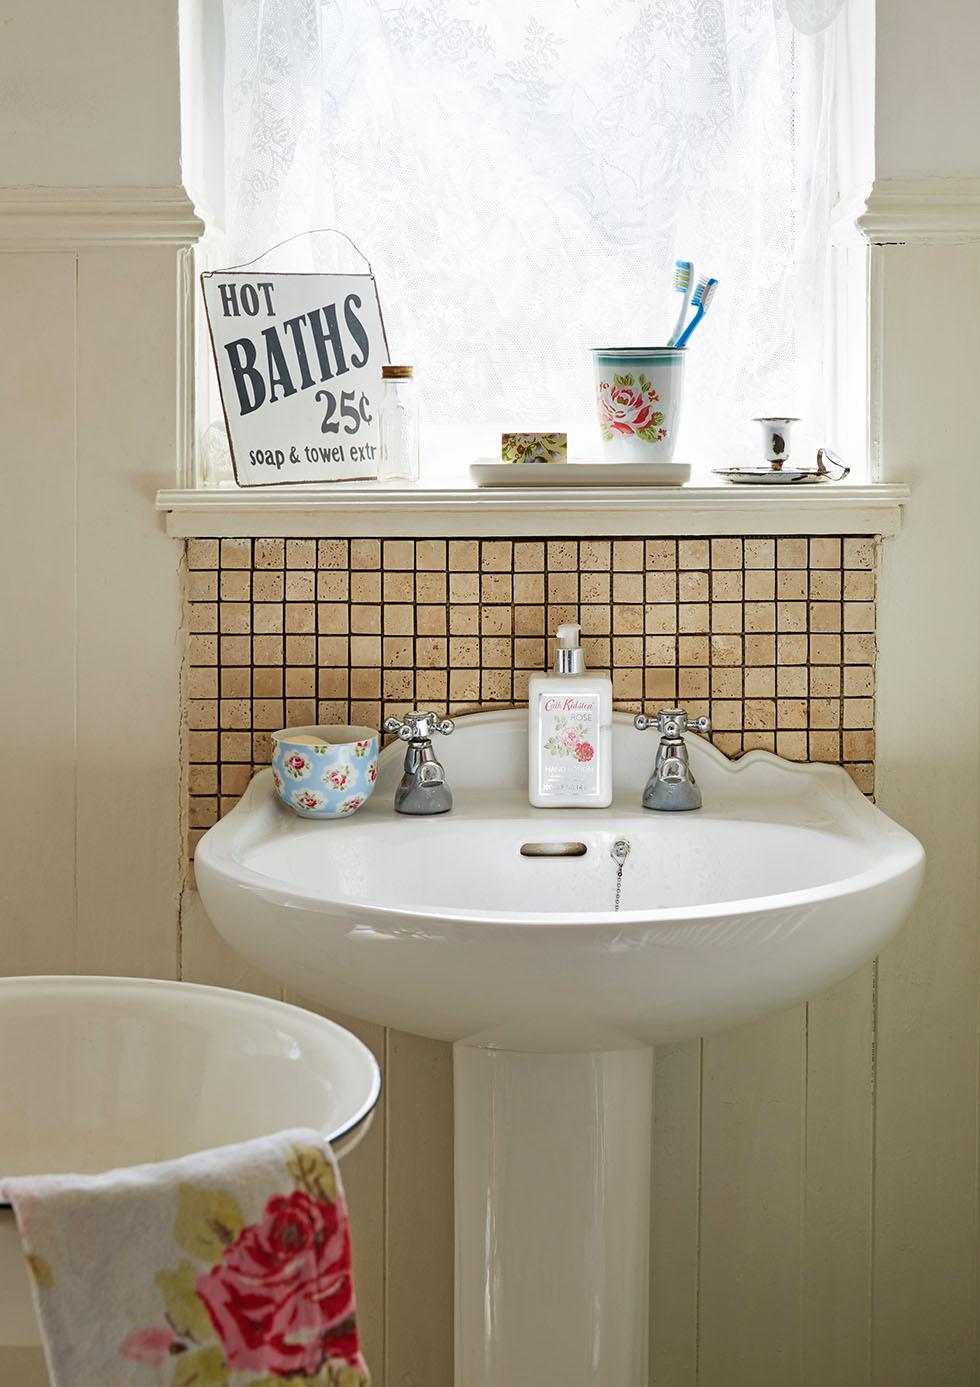 prescott-davies-bathroom